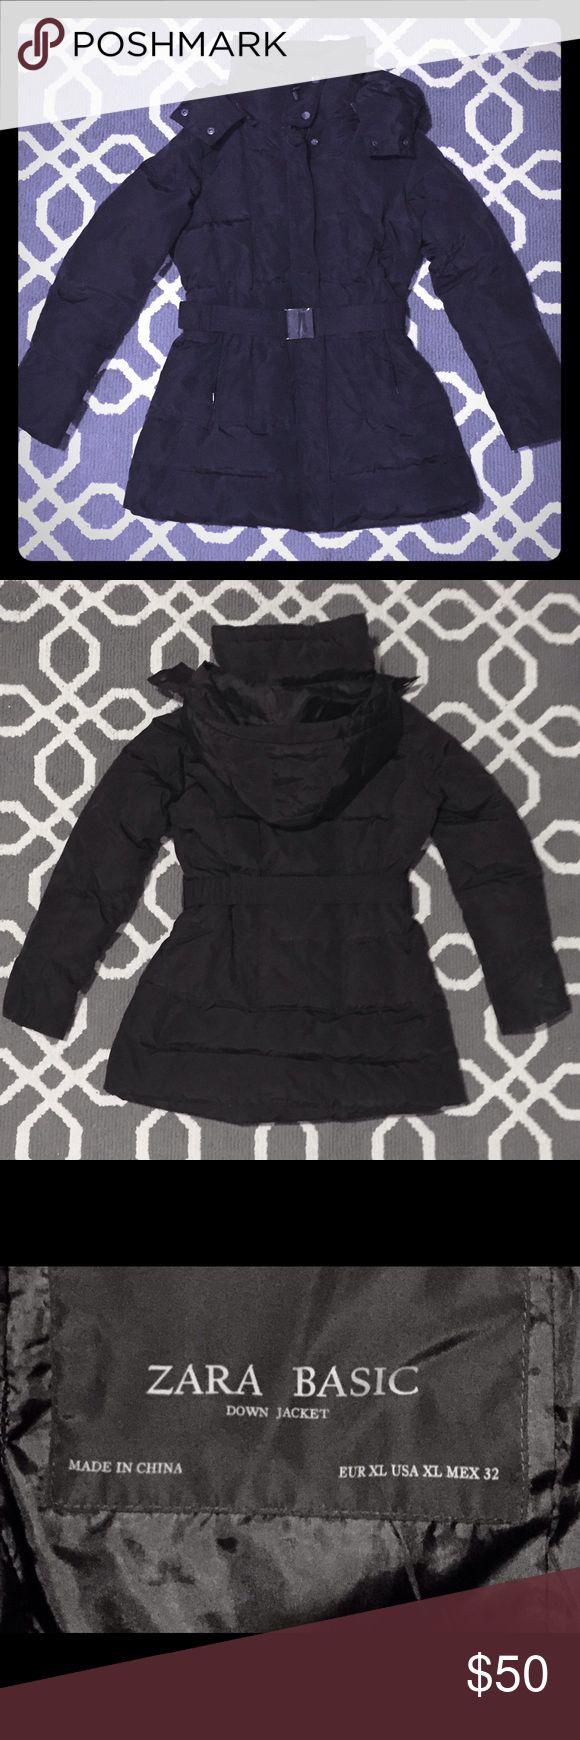 Zara Basic black down jacket, Ladies XL Zara Basic black down jacket, Ladies XL. Excellent condition; only worn a few times. Jacket is fitted at waist, has a detachable hood & is super warm! Zara Jackets & Coats Puffers